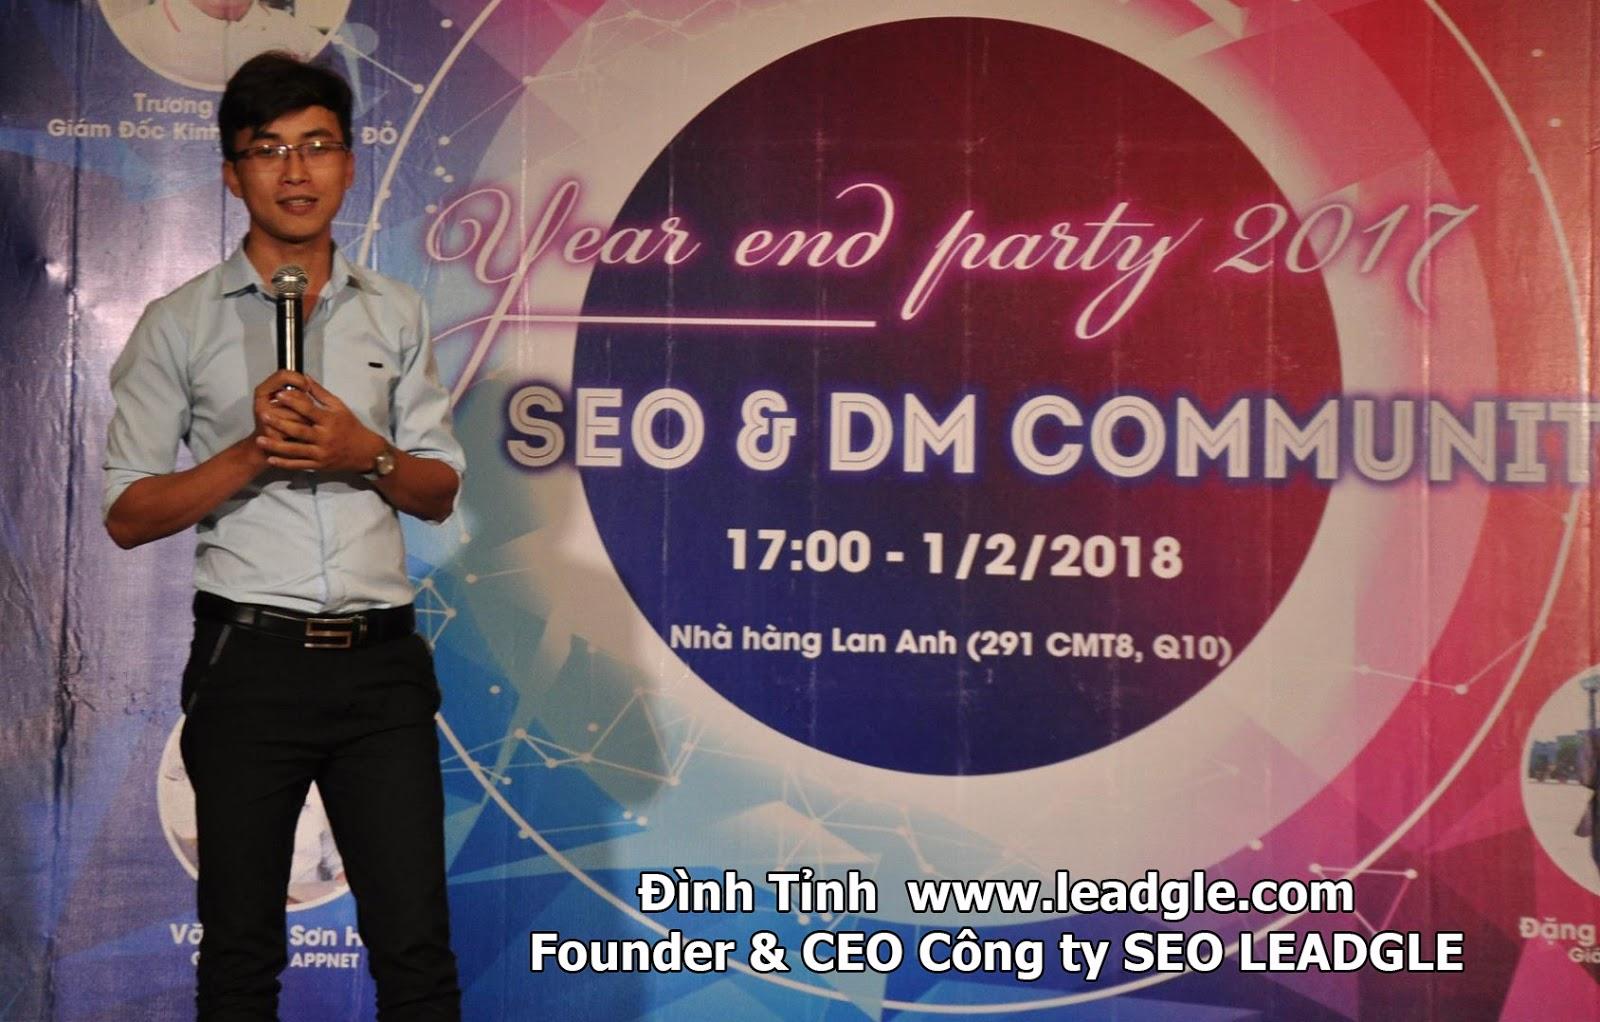 SEO & Digital Marketing Community